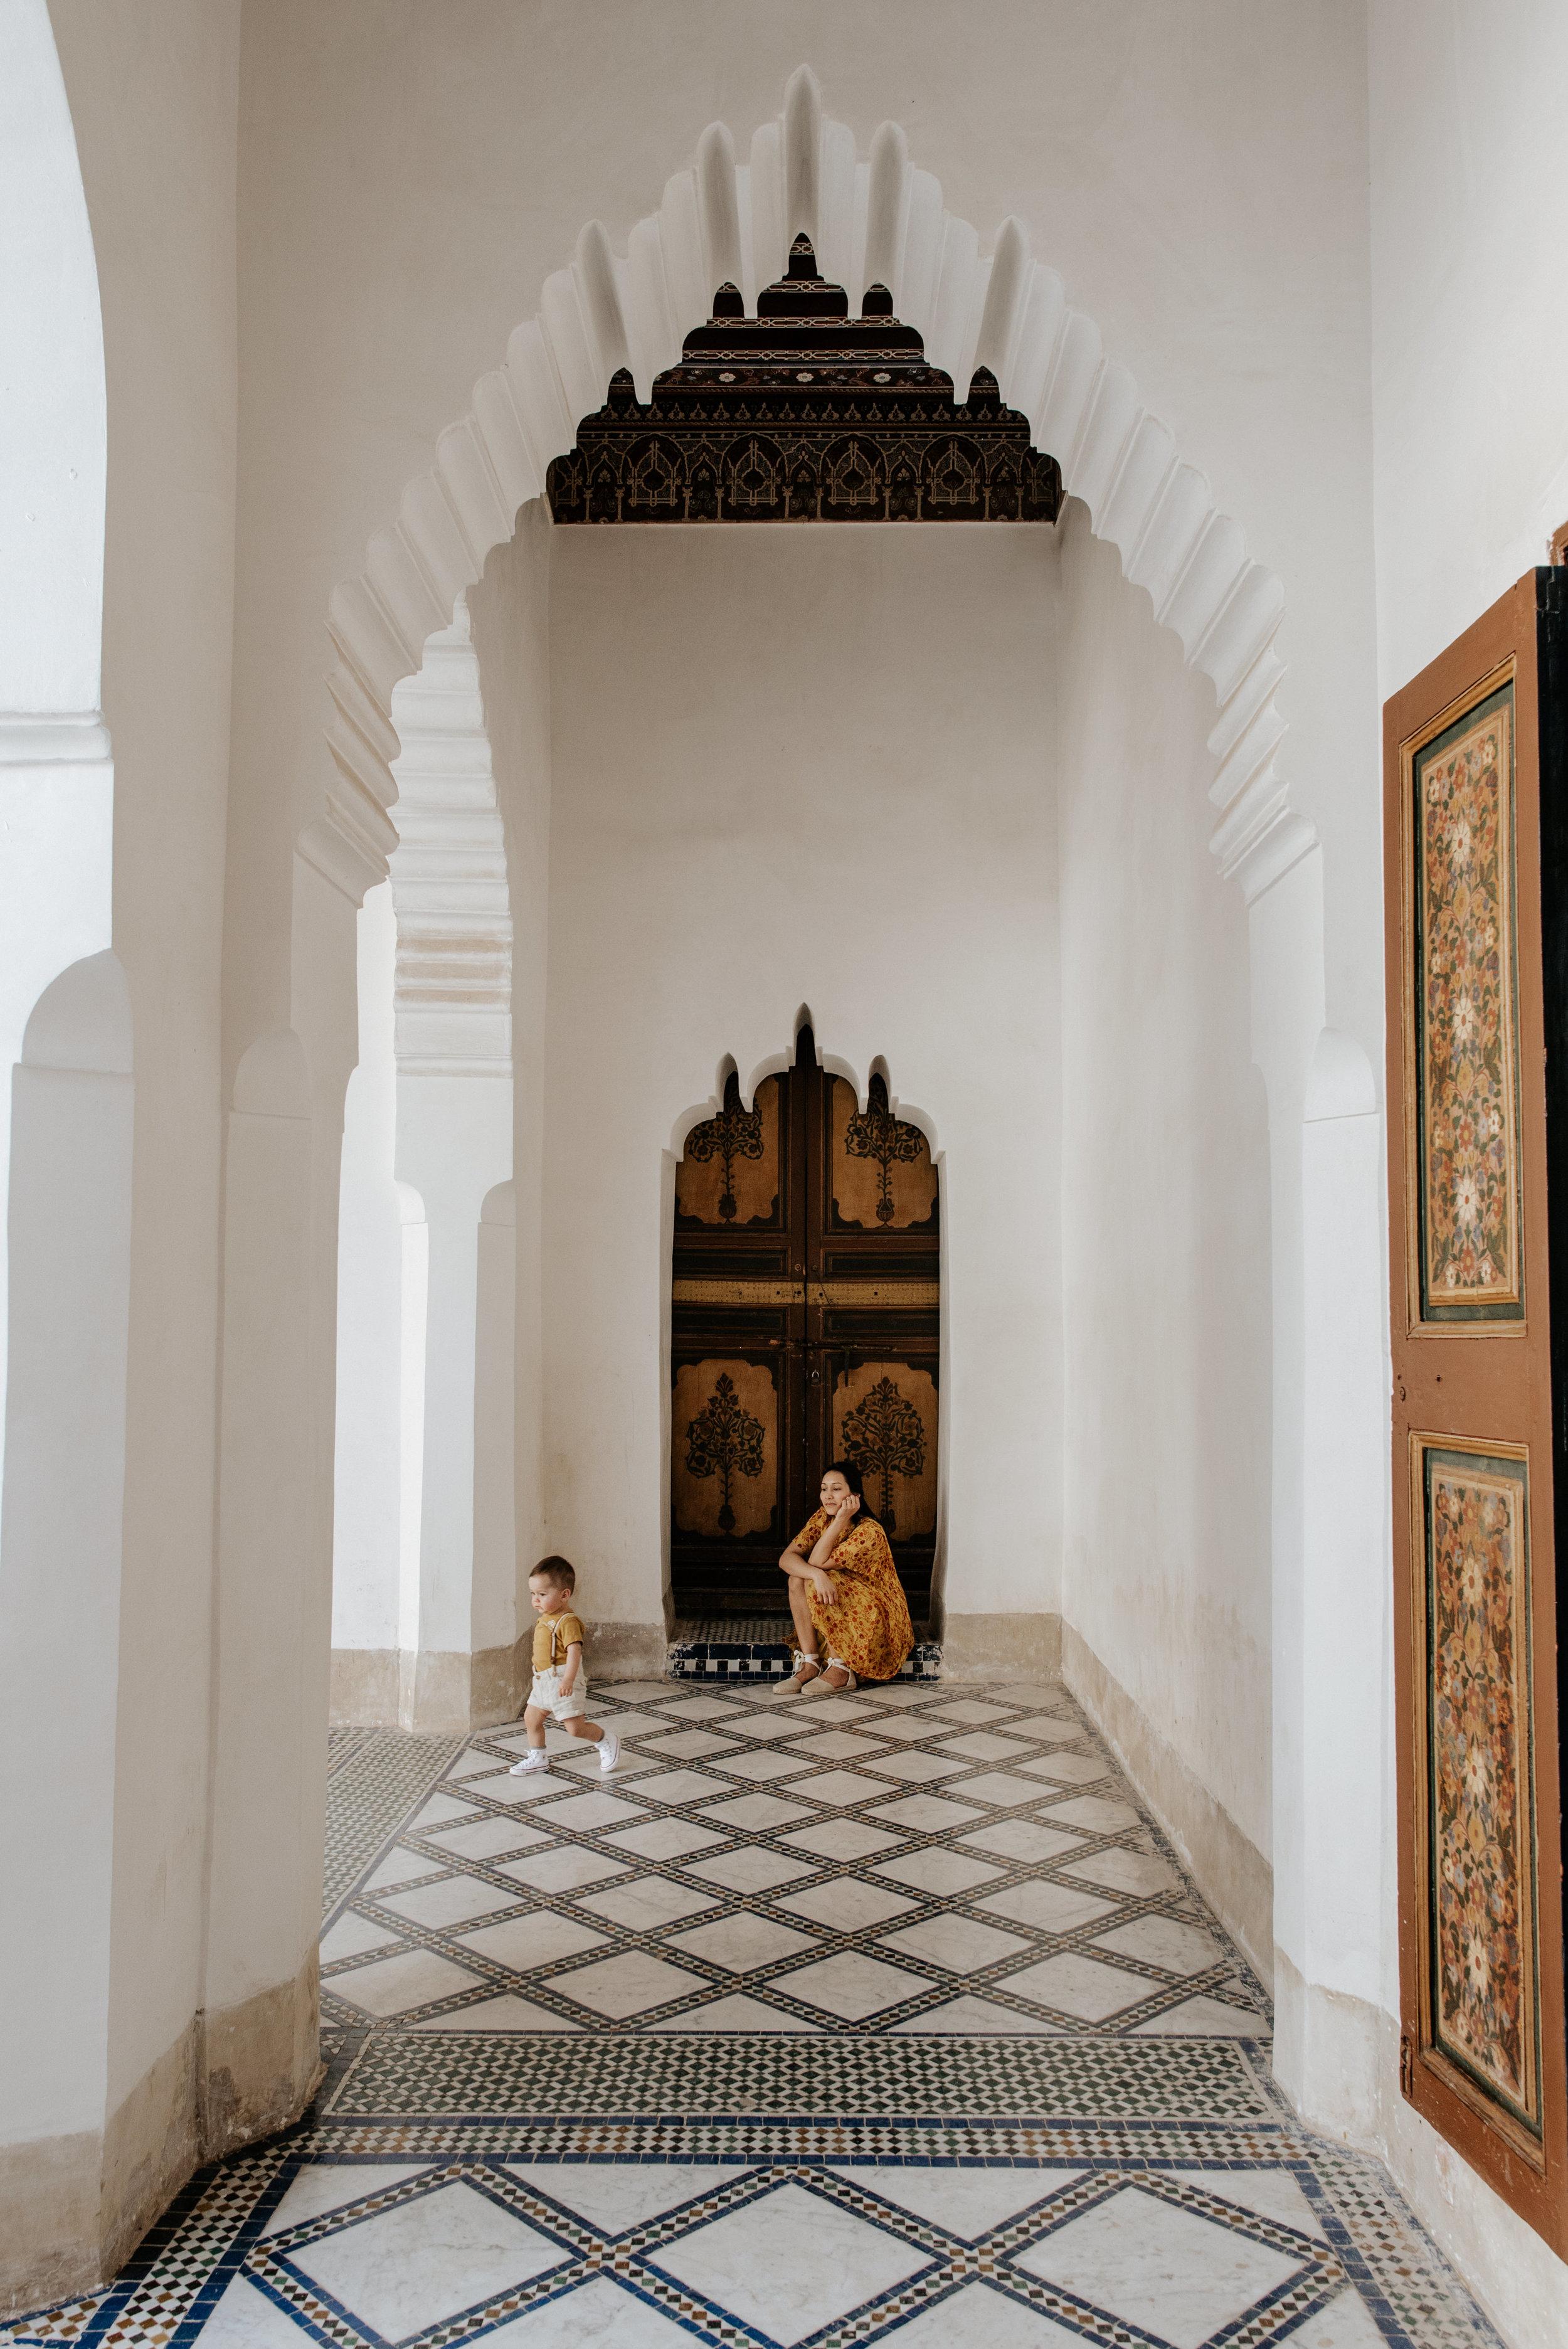 Morocco-190.jpg